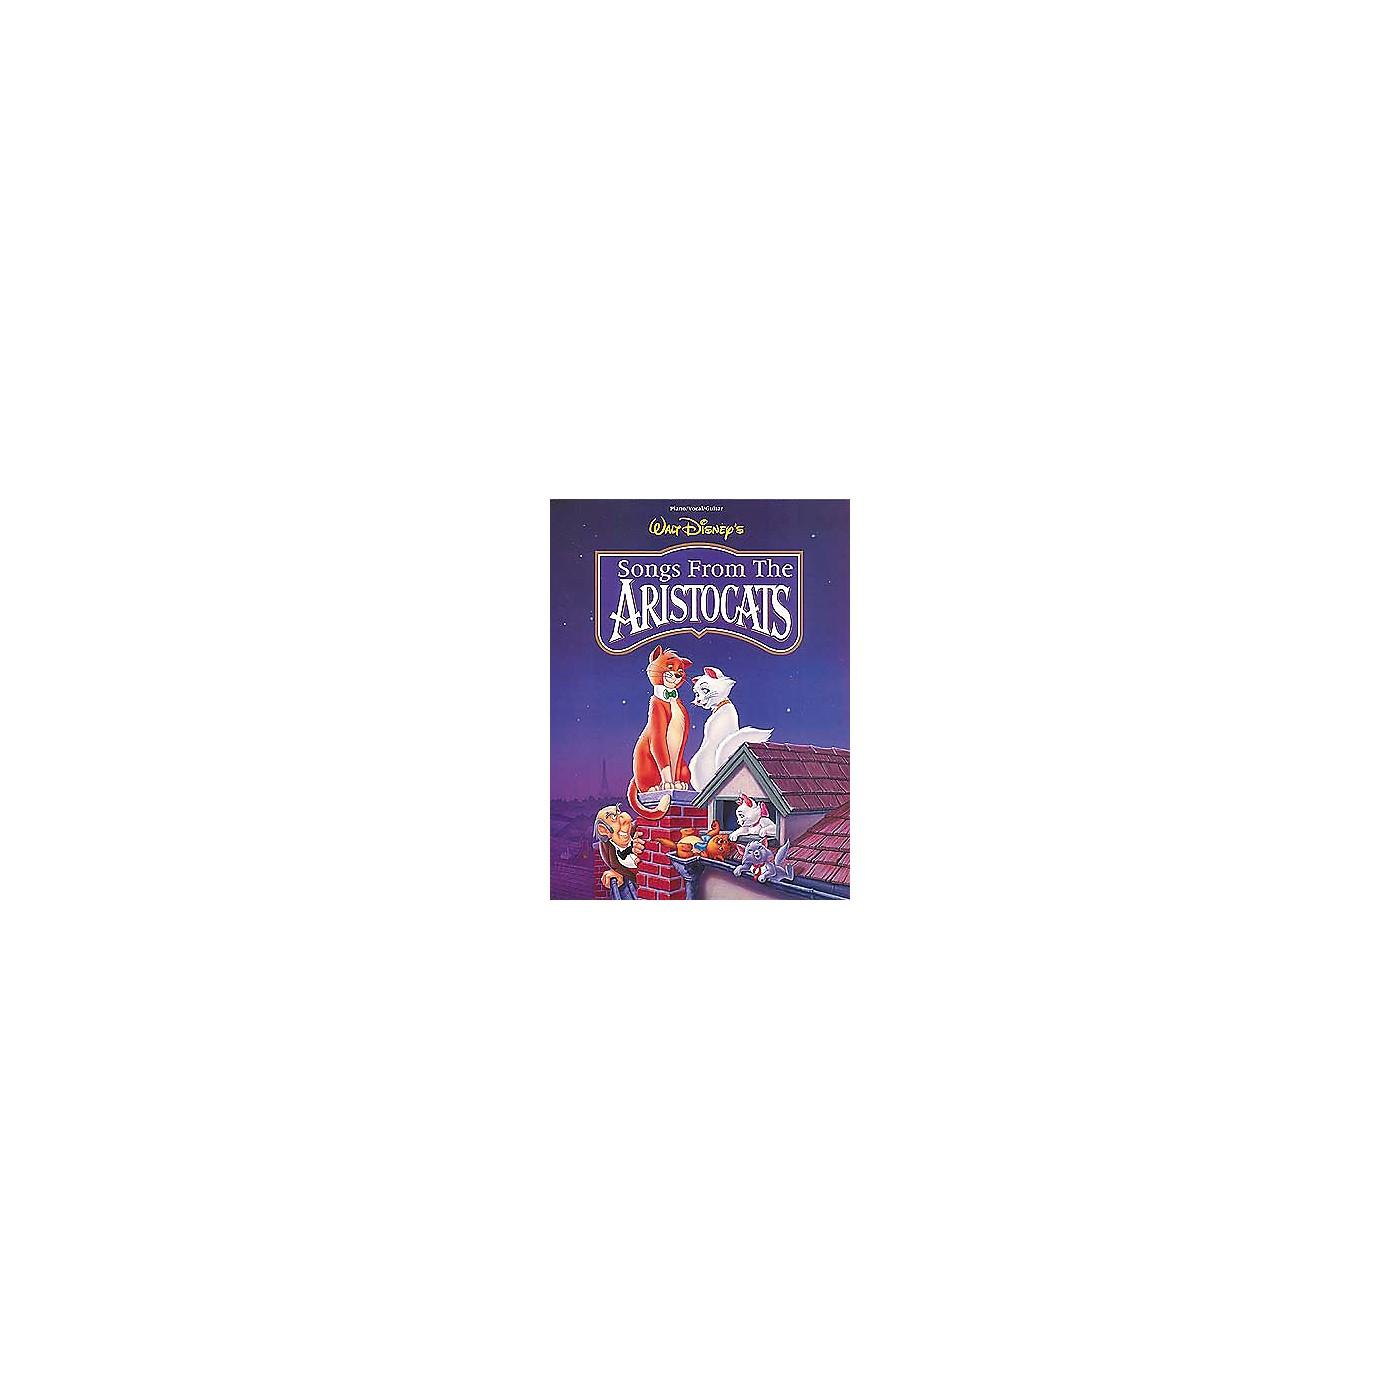 Hal Leonard The Aristocats Piano, Vocal, Guitar Songbook thumbnail